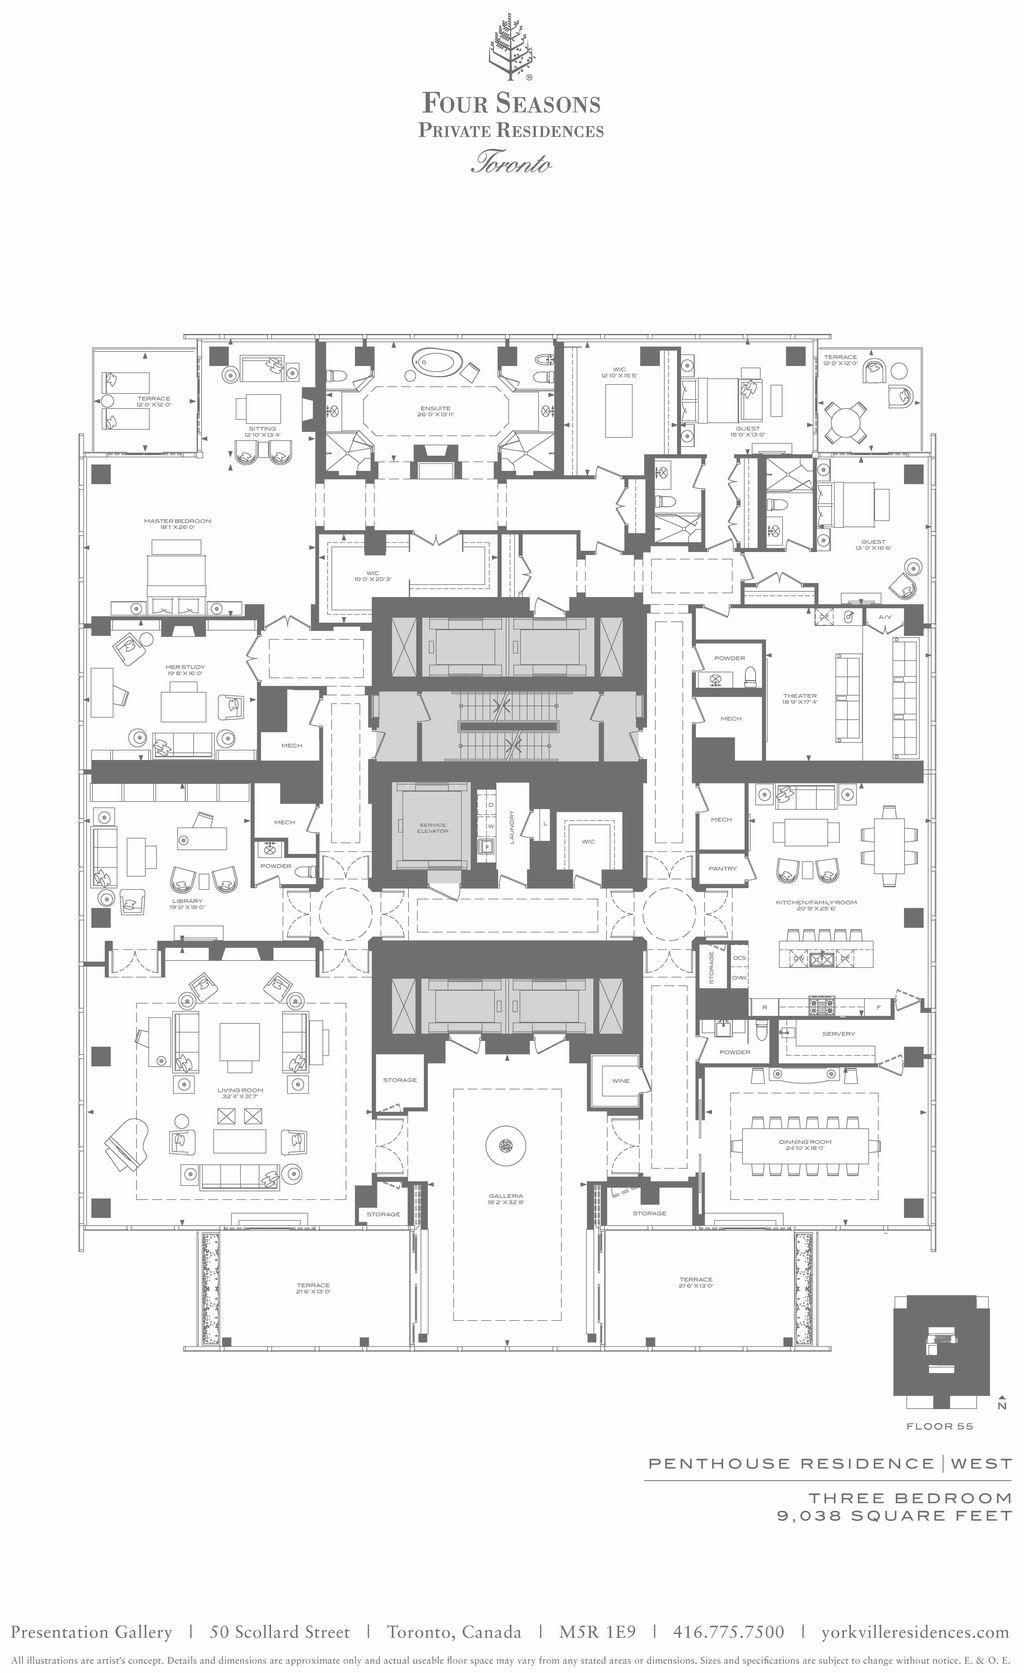 9 000 Square Foot Apartment Residence Main Floor Plan Four Seasons Toronto Penthouse Hotel Floor Plan Apartment Floor Plans Hotel Floor